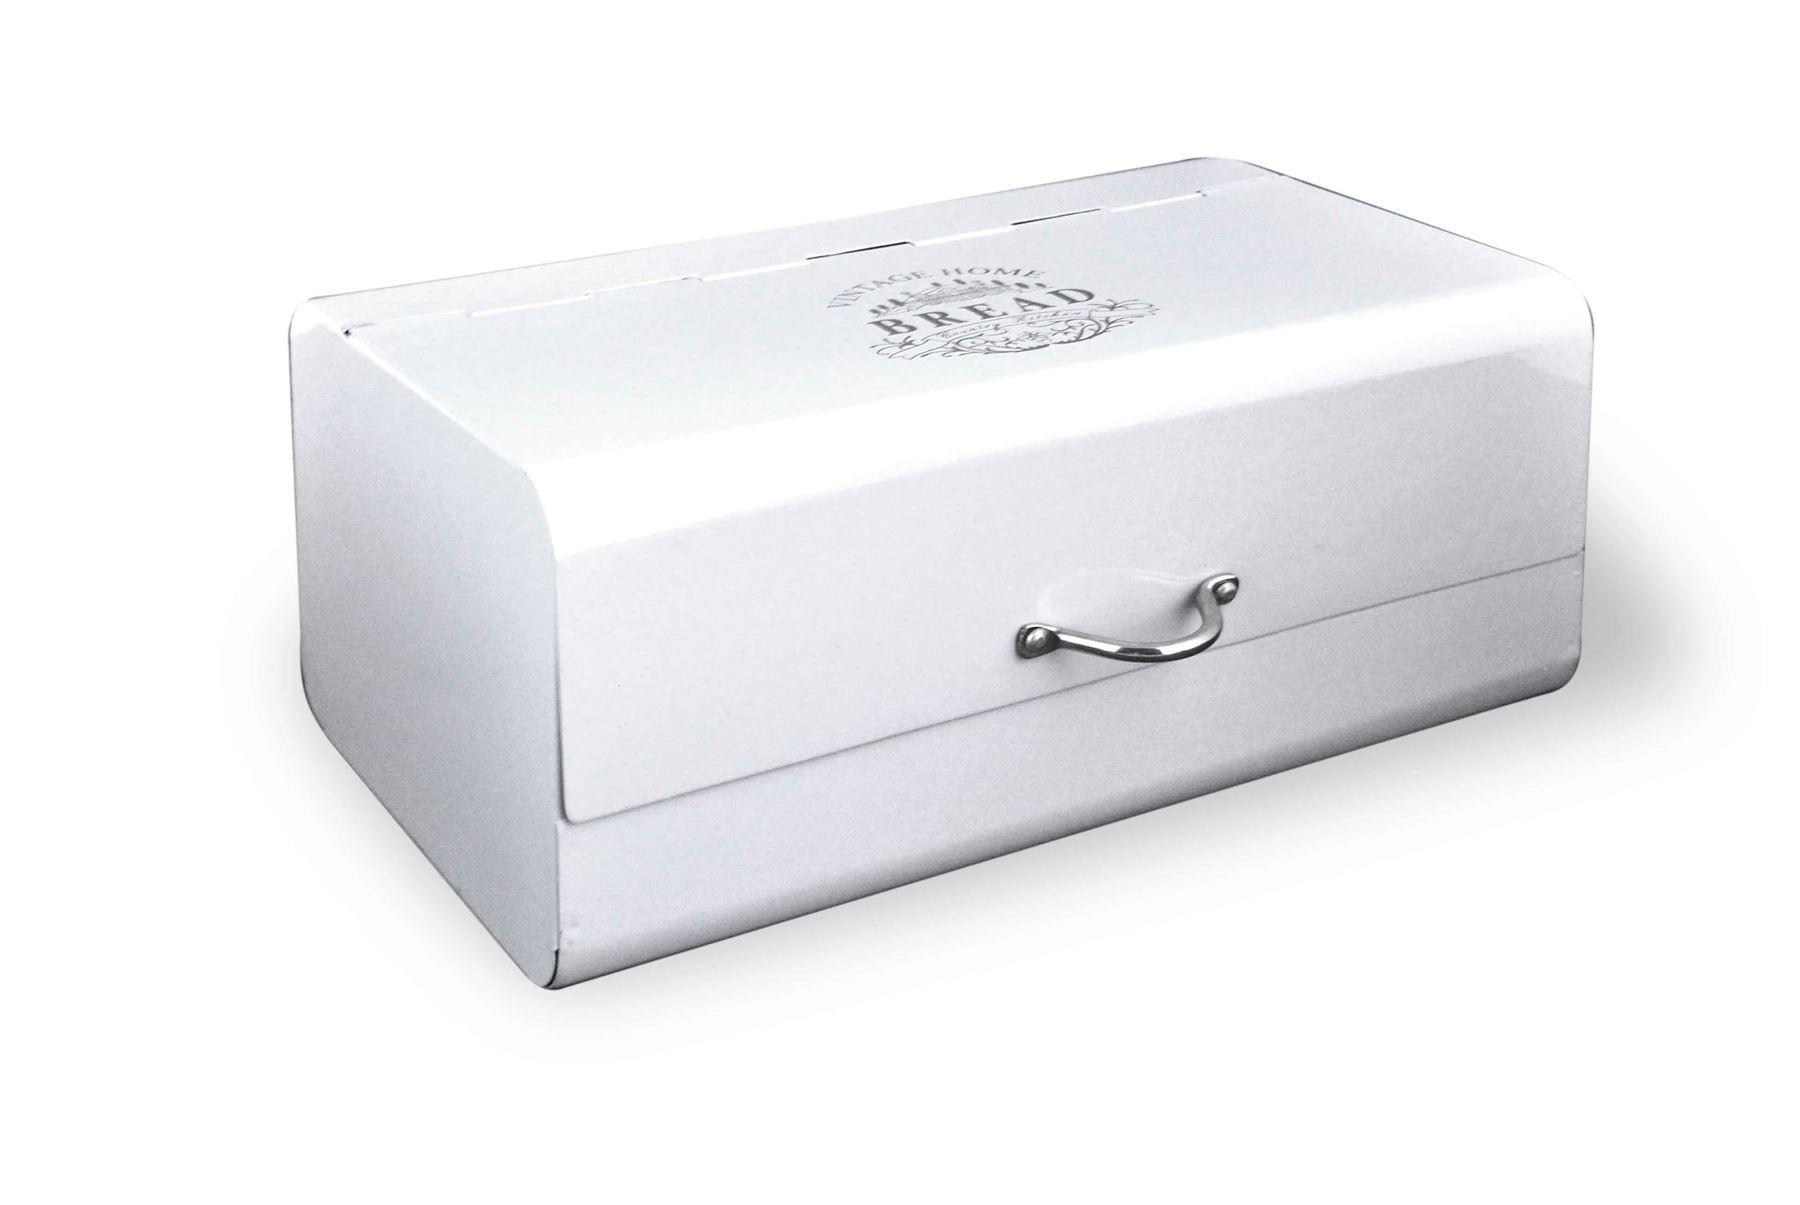 kitchen storage boxes tall table sets bread holder bin box vintage design home